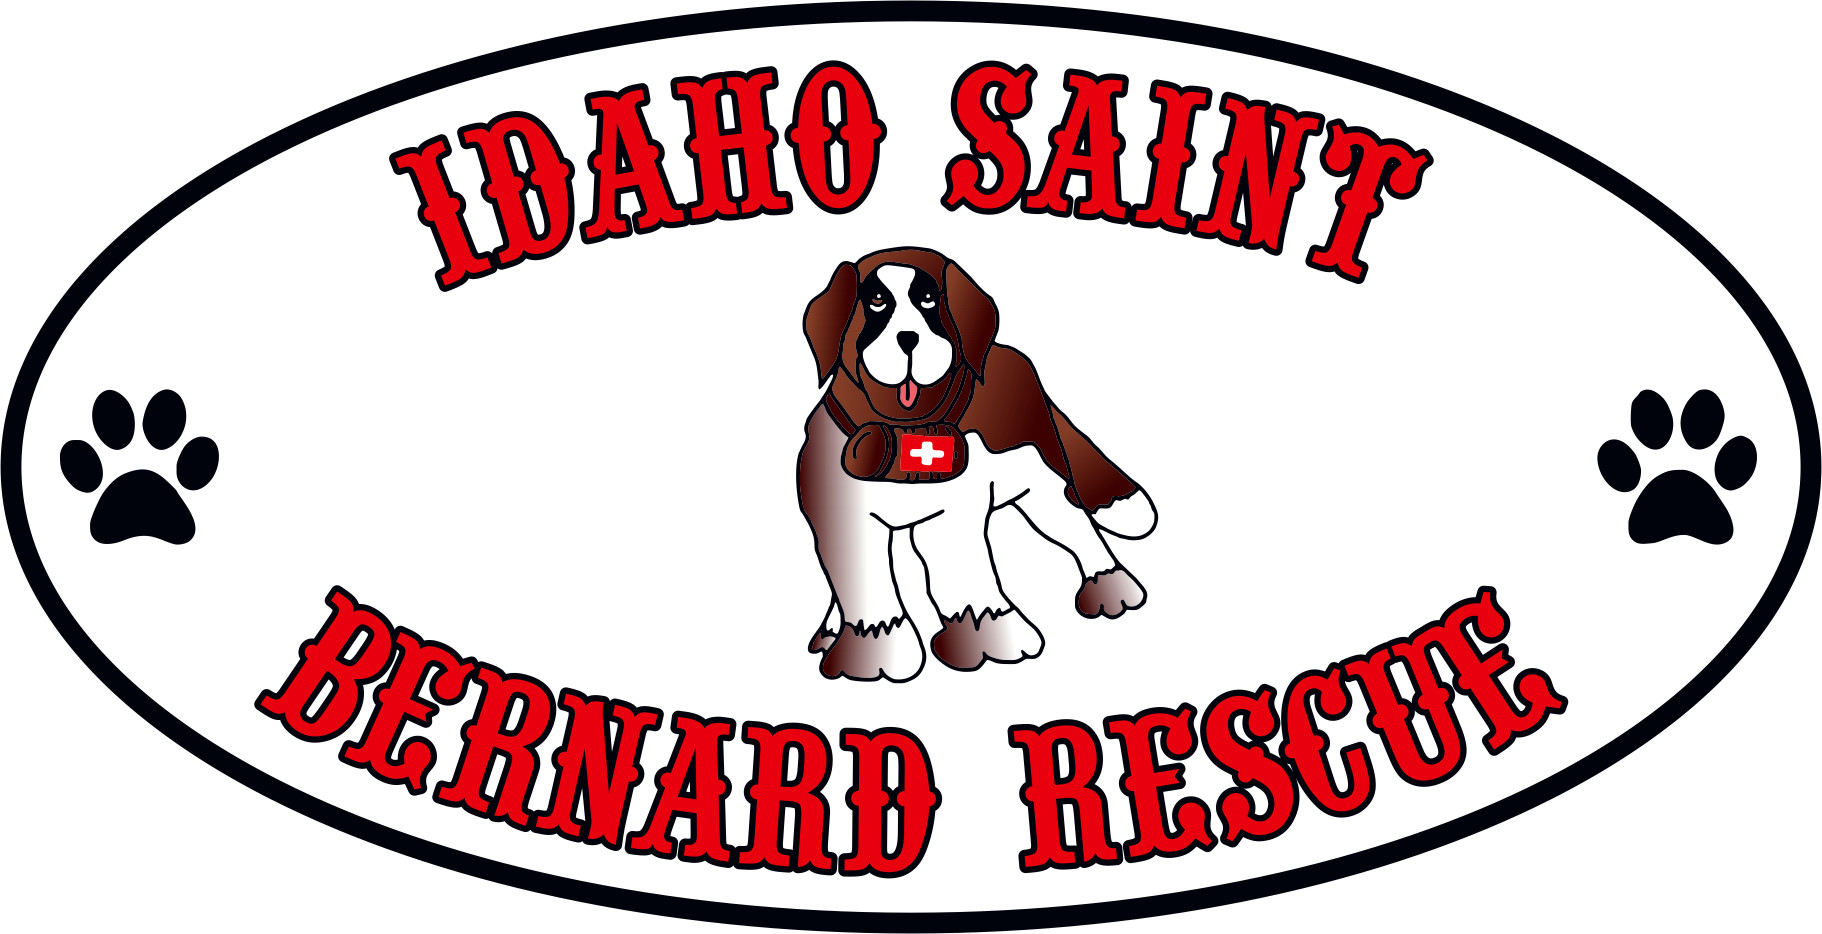 Pets for Adoption at Idaho Saint Bernard Rescue in Boise ID